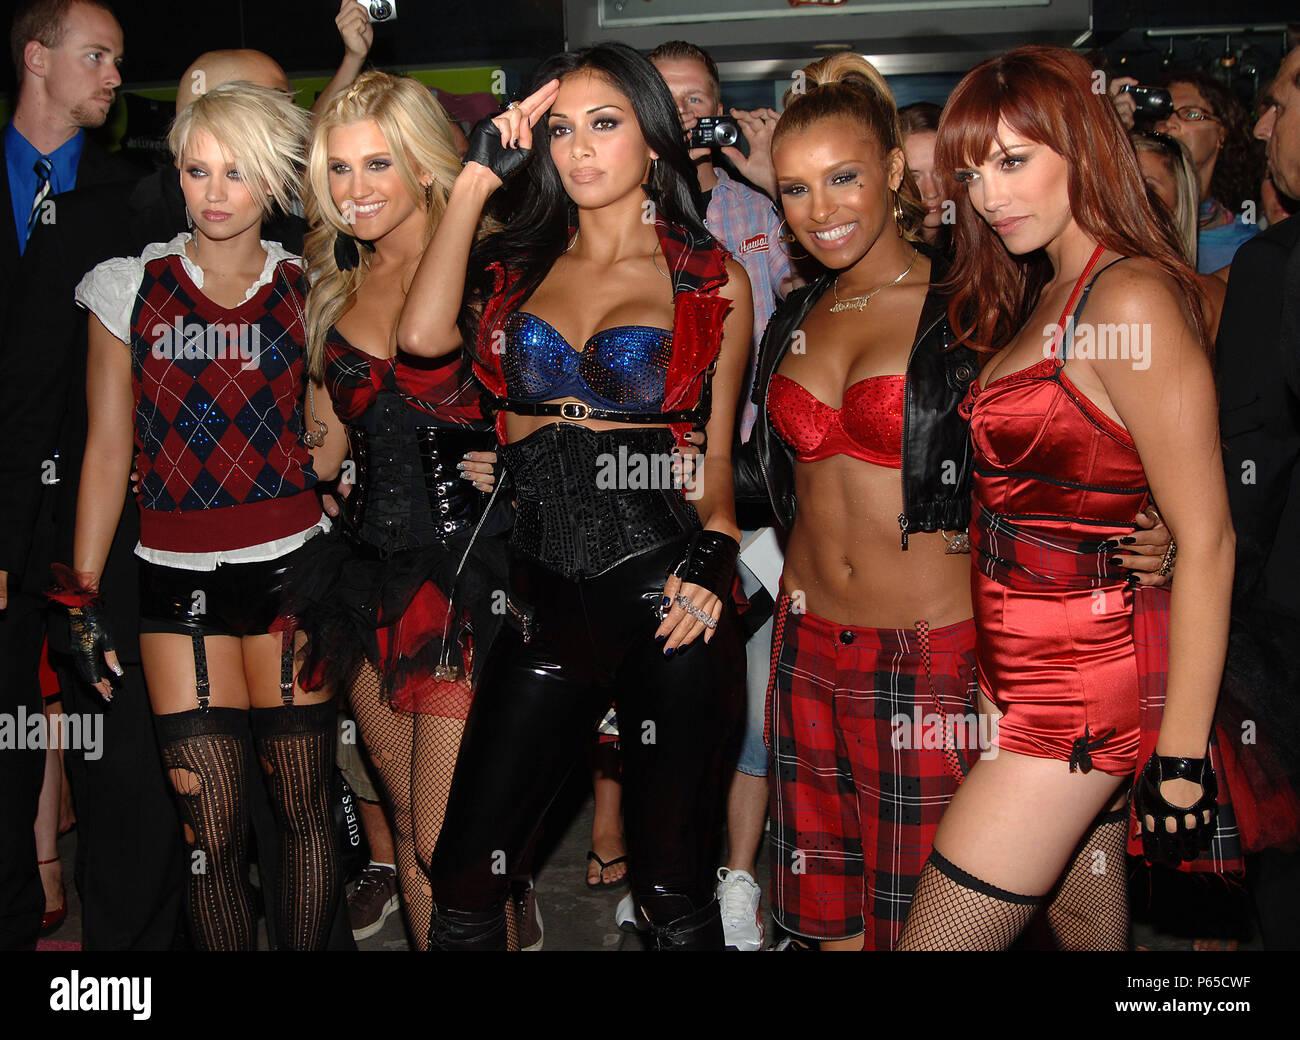 Jessica Sutta Pussycat Dolls